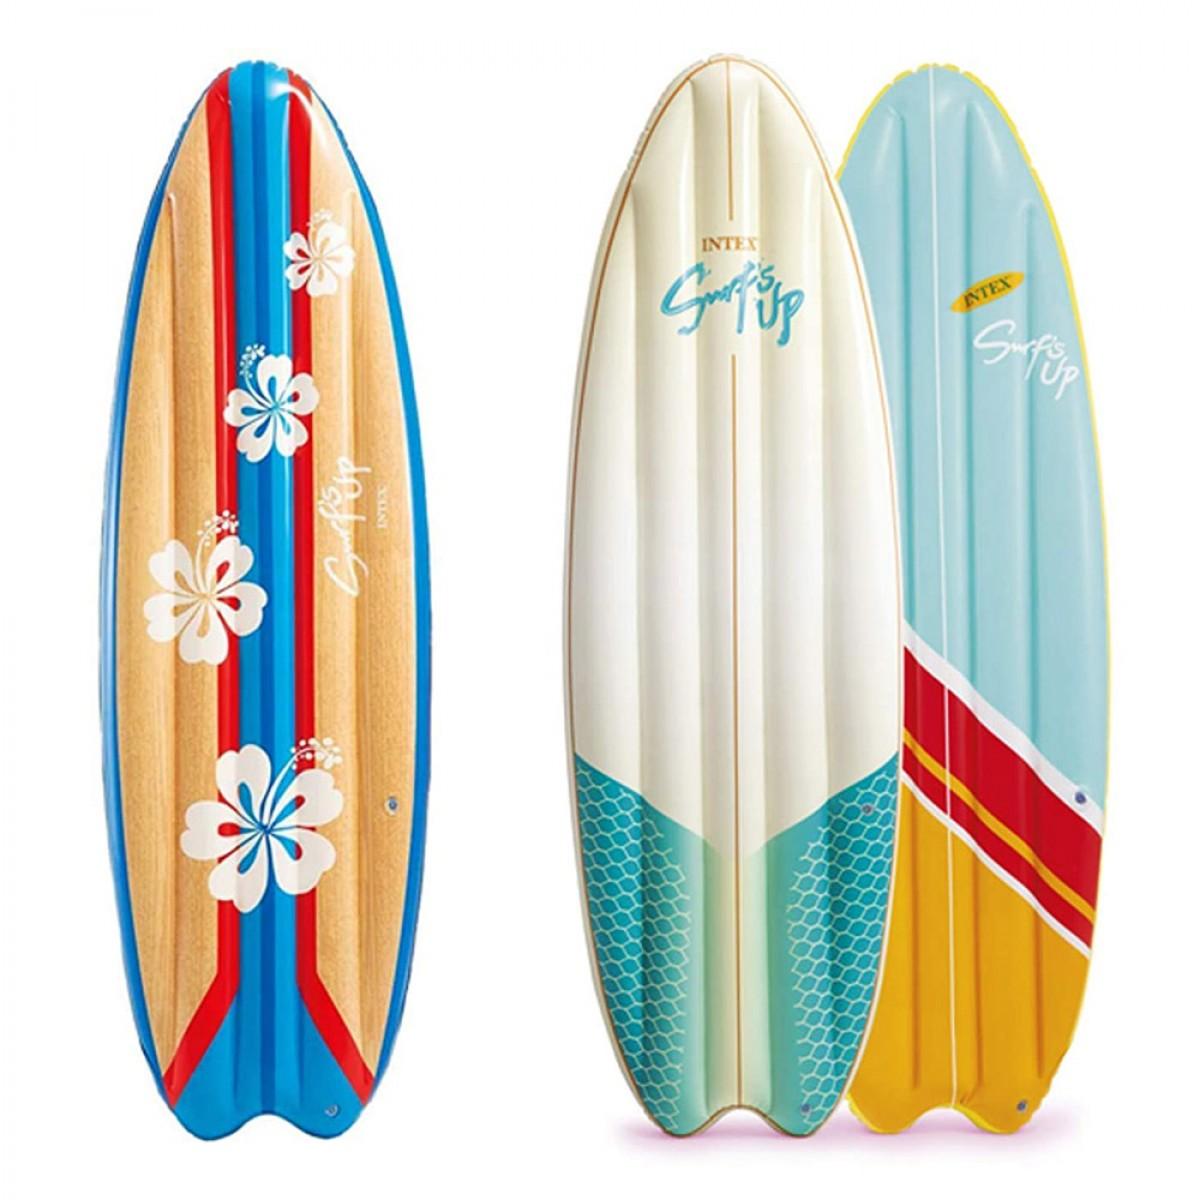 INTEX ΣΤΡΩΜΑ ΘΑΛΑΣΣΗΣ SURFS UP MATS 58152 (178X69 ΕΚ.)